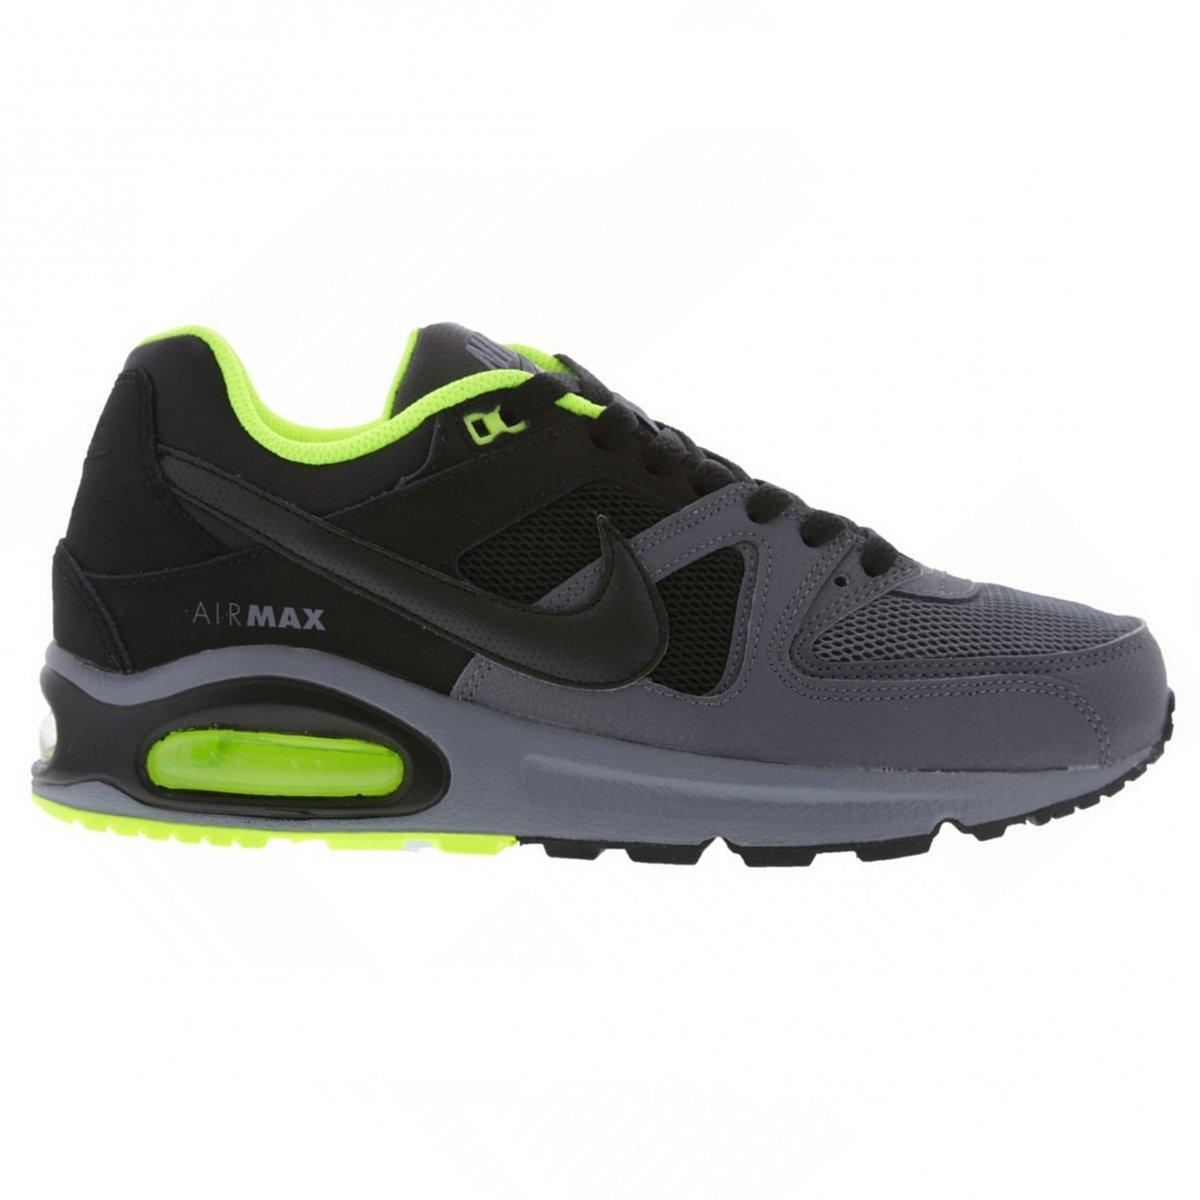 80db1a91bc Tênis Masculino Nike Air Max Command 629993-038 Preto Grafite Verde Limão